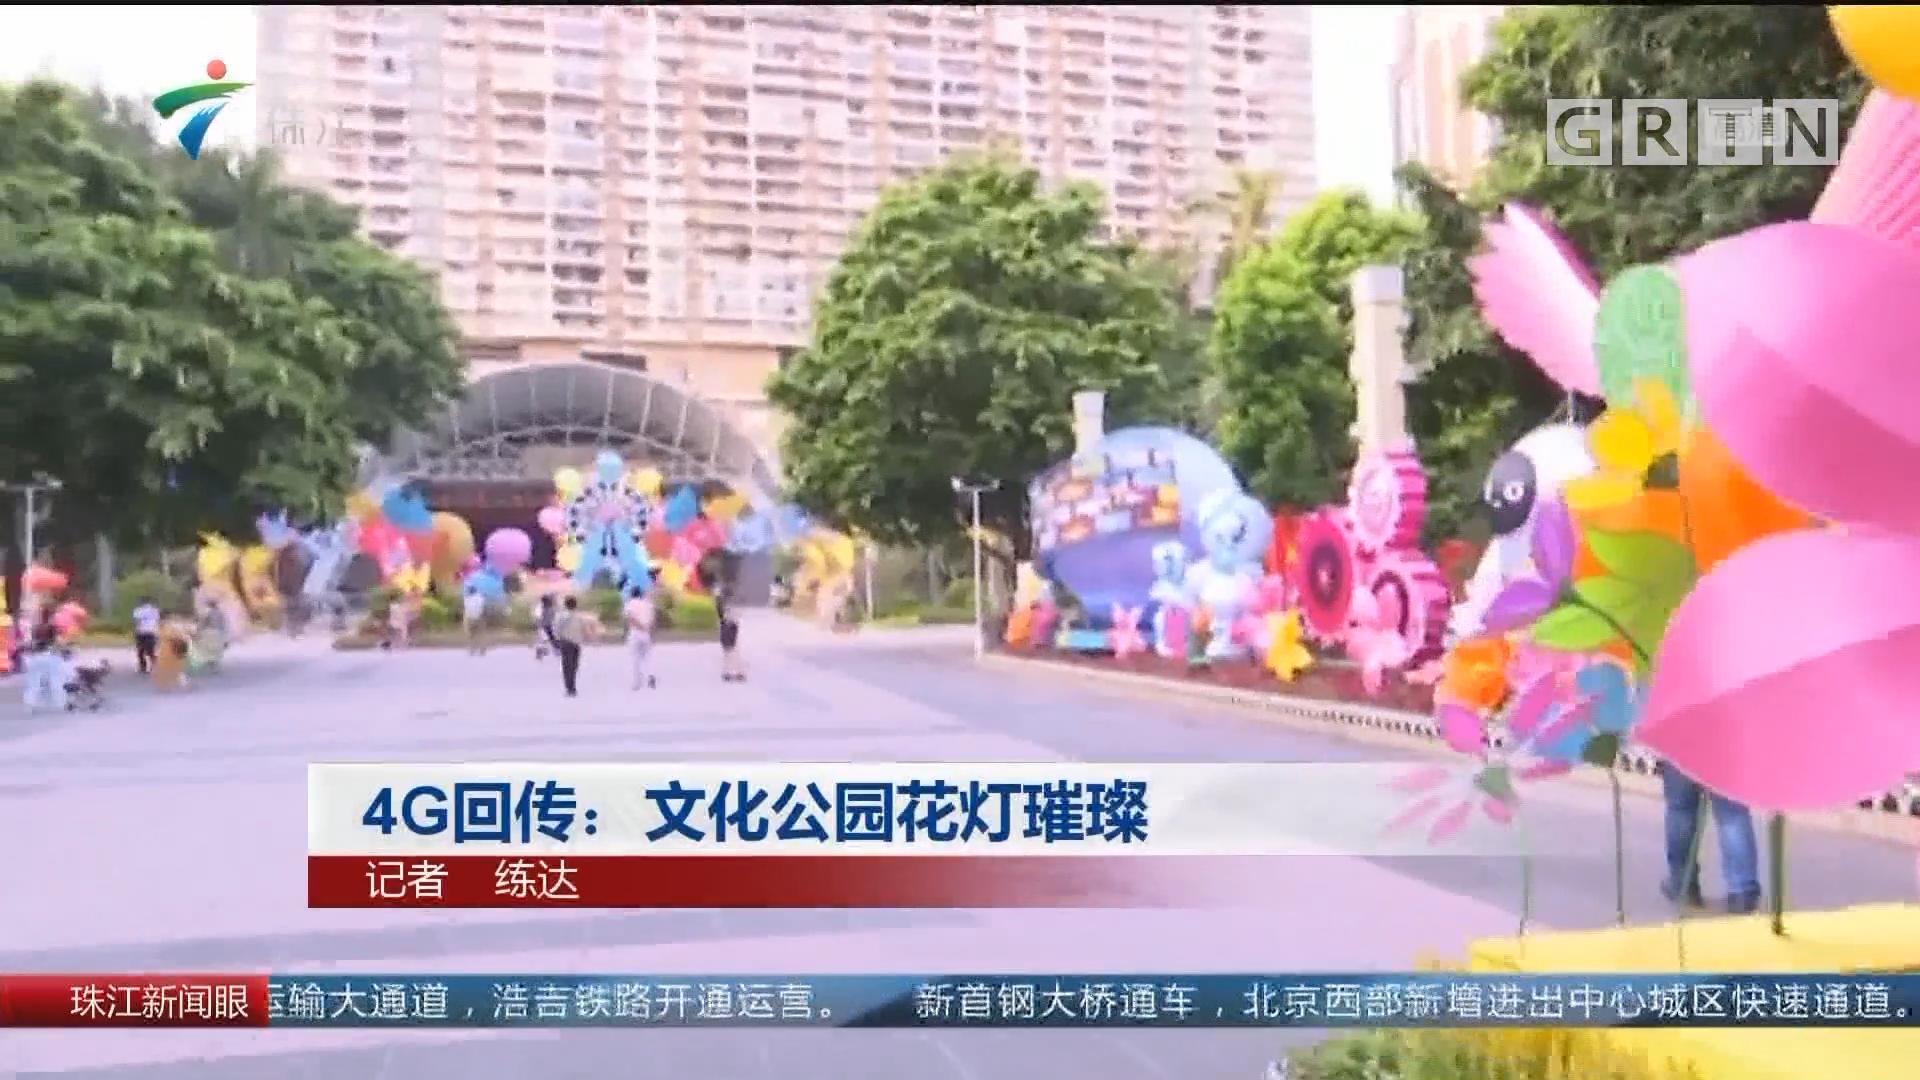 4G回傳:文化公園花燈璀璨